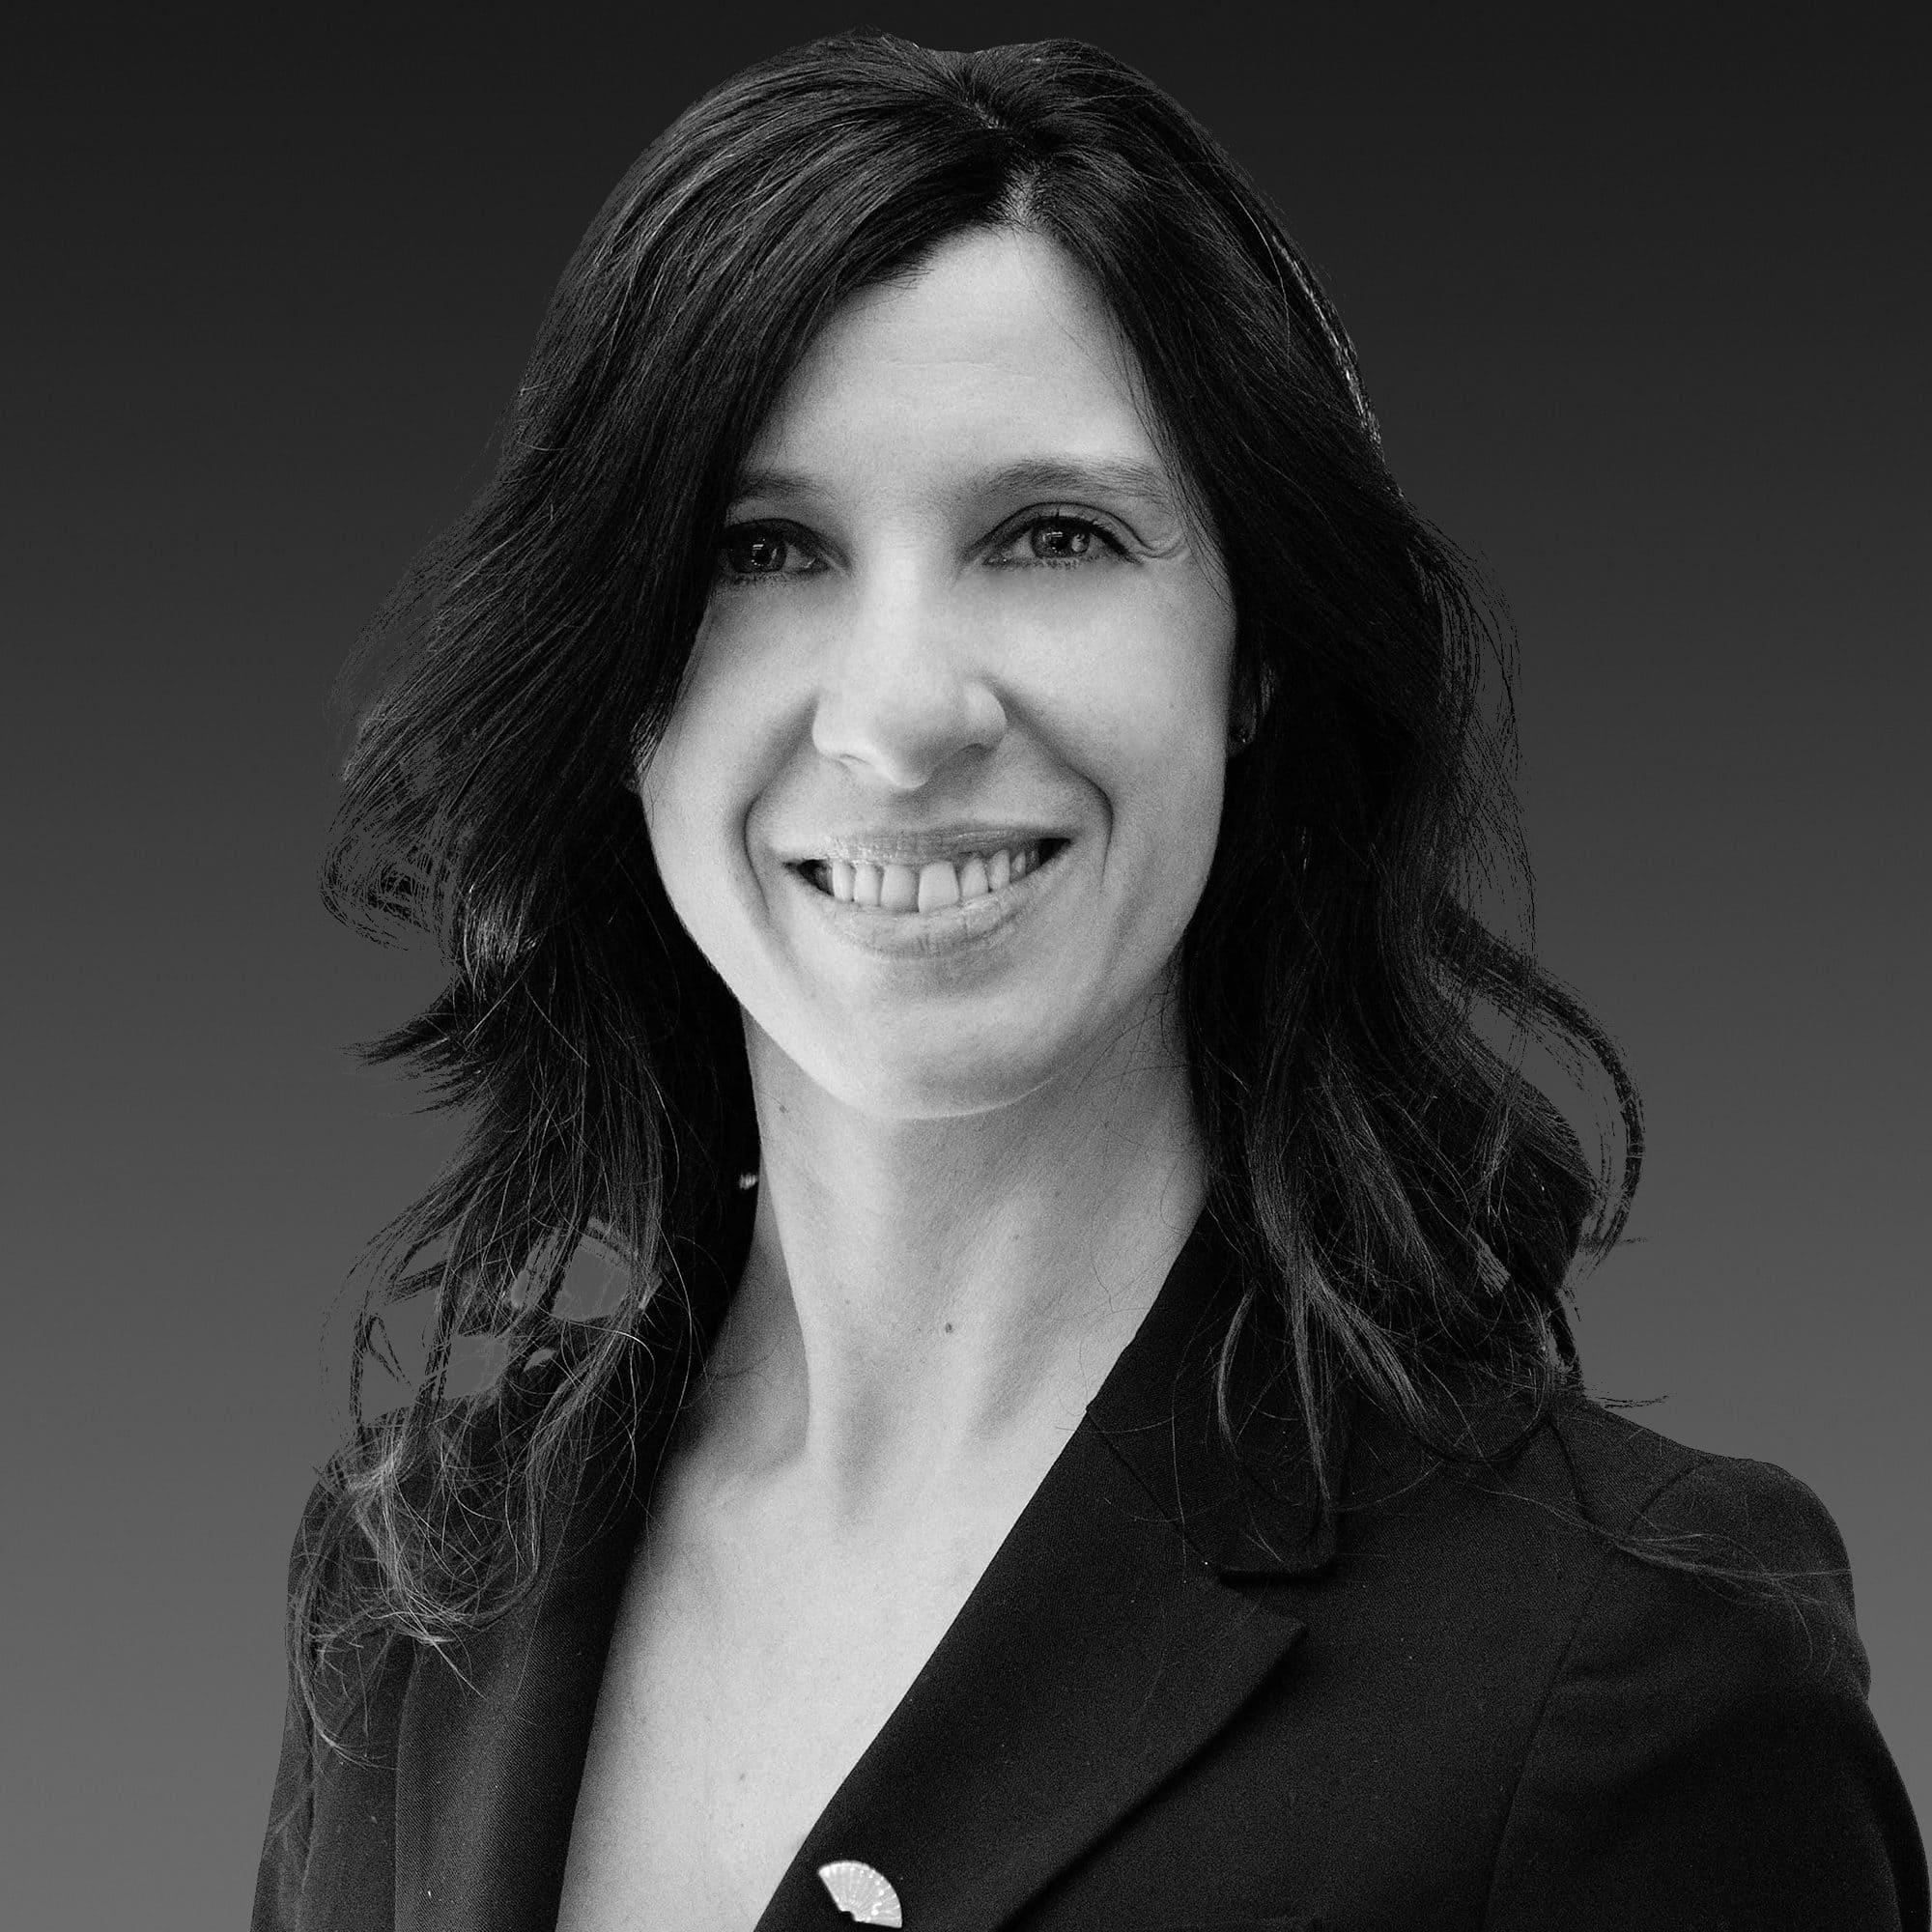 Marina Savini, Assistant Public Relations Manager